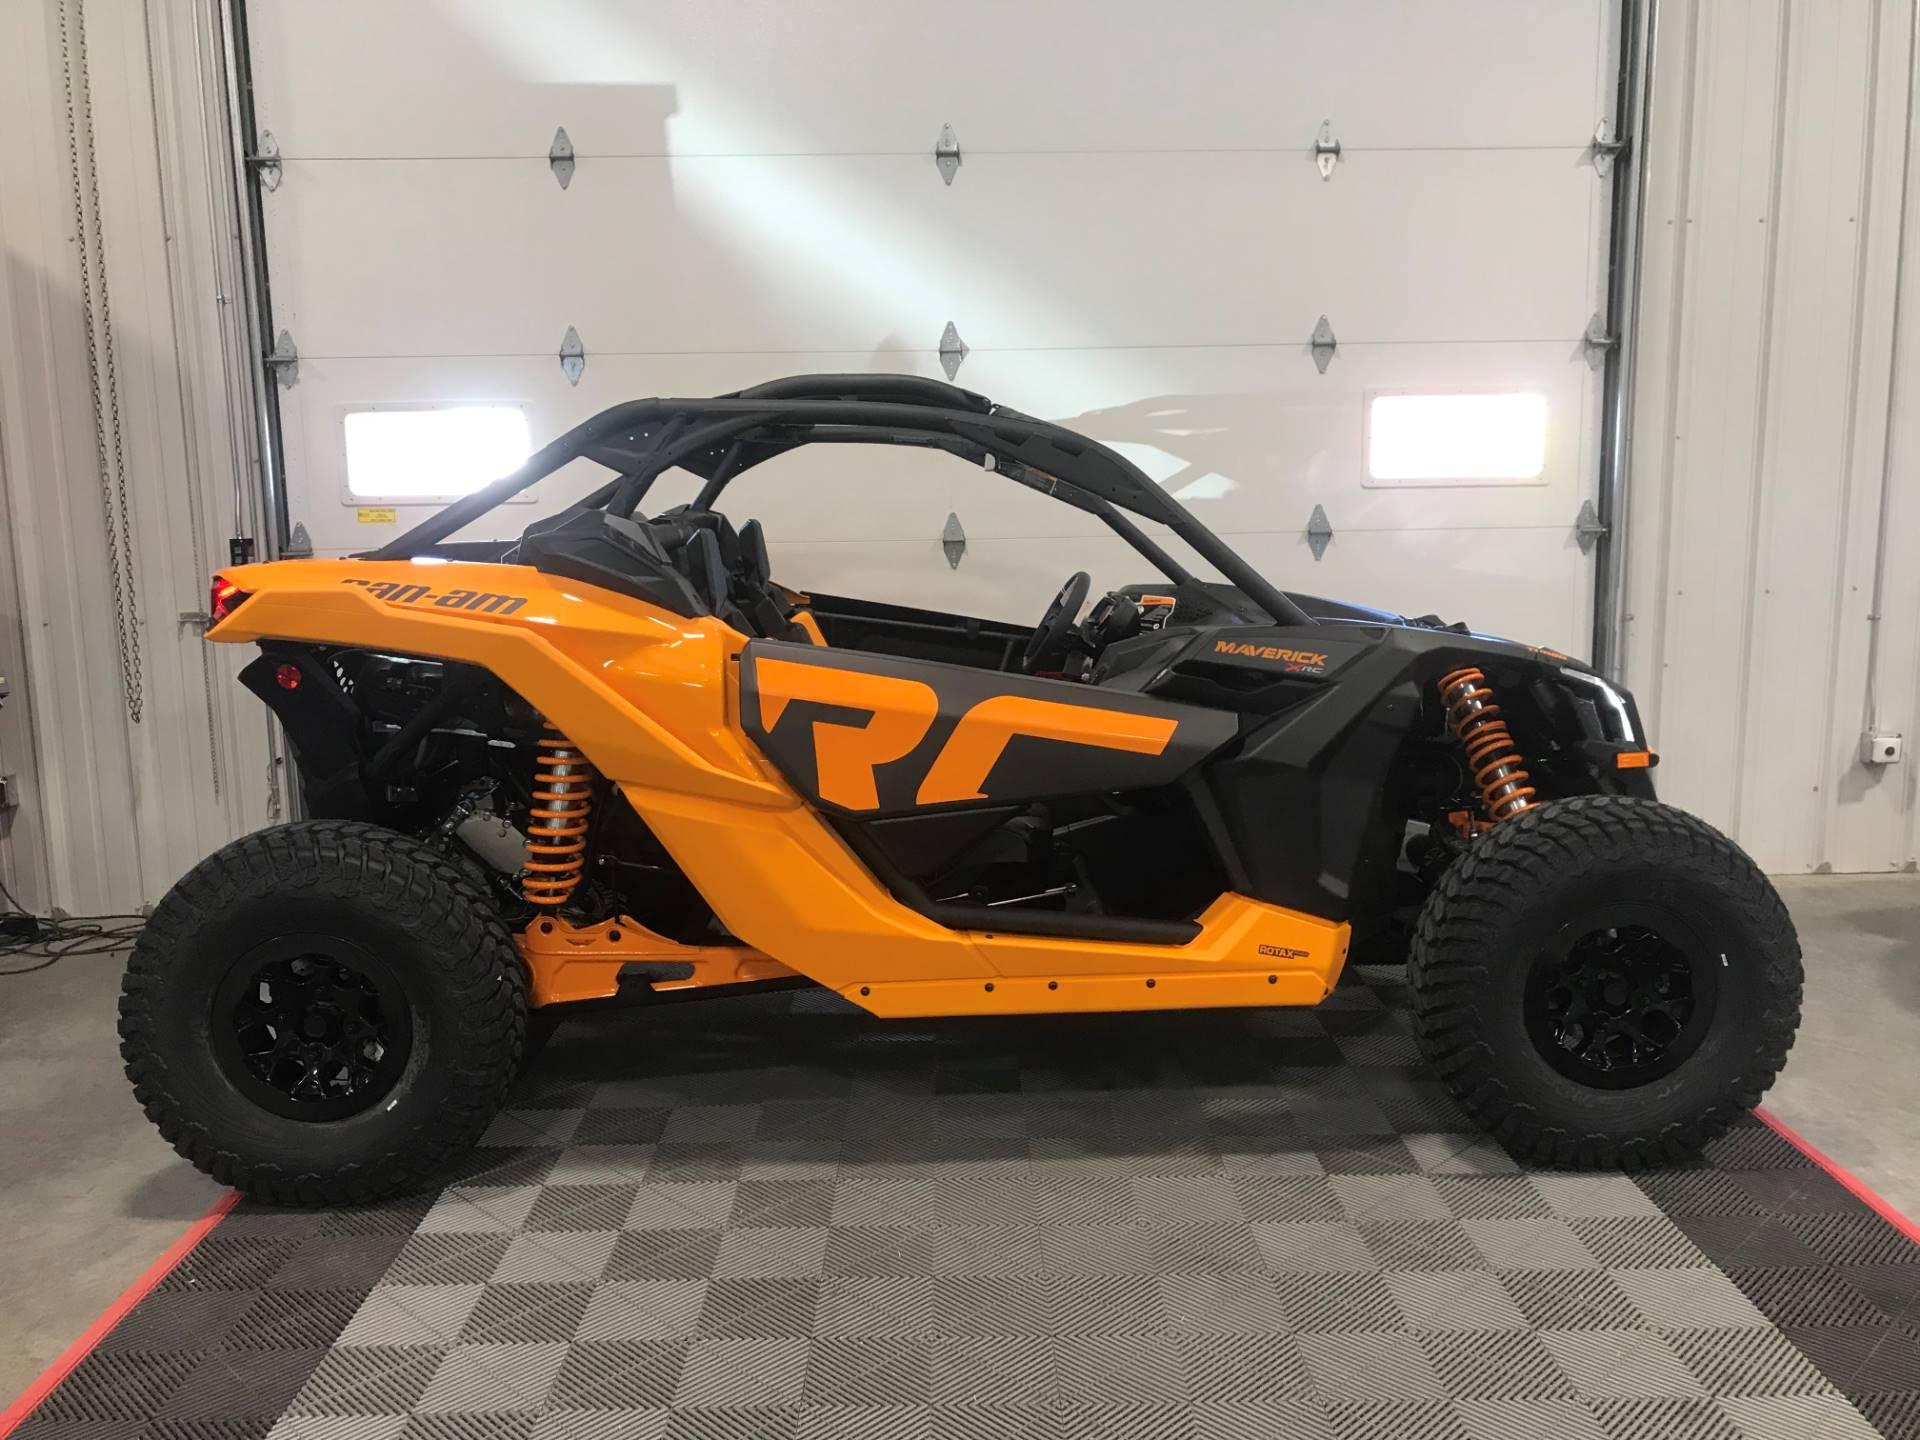 2020 Can-Am Maverick X3 X RC Turbo in Ames, Iowa